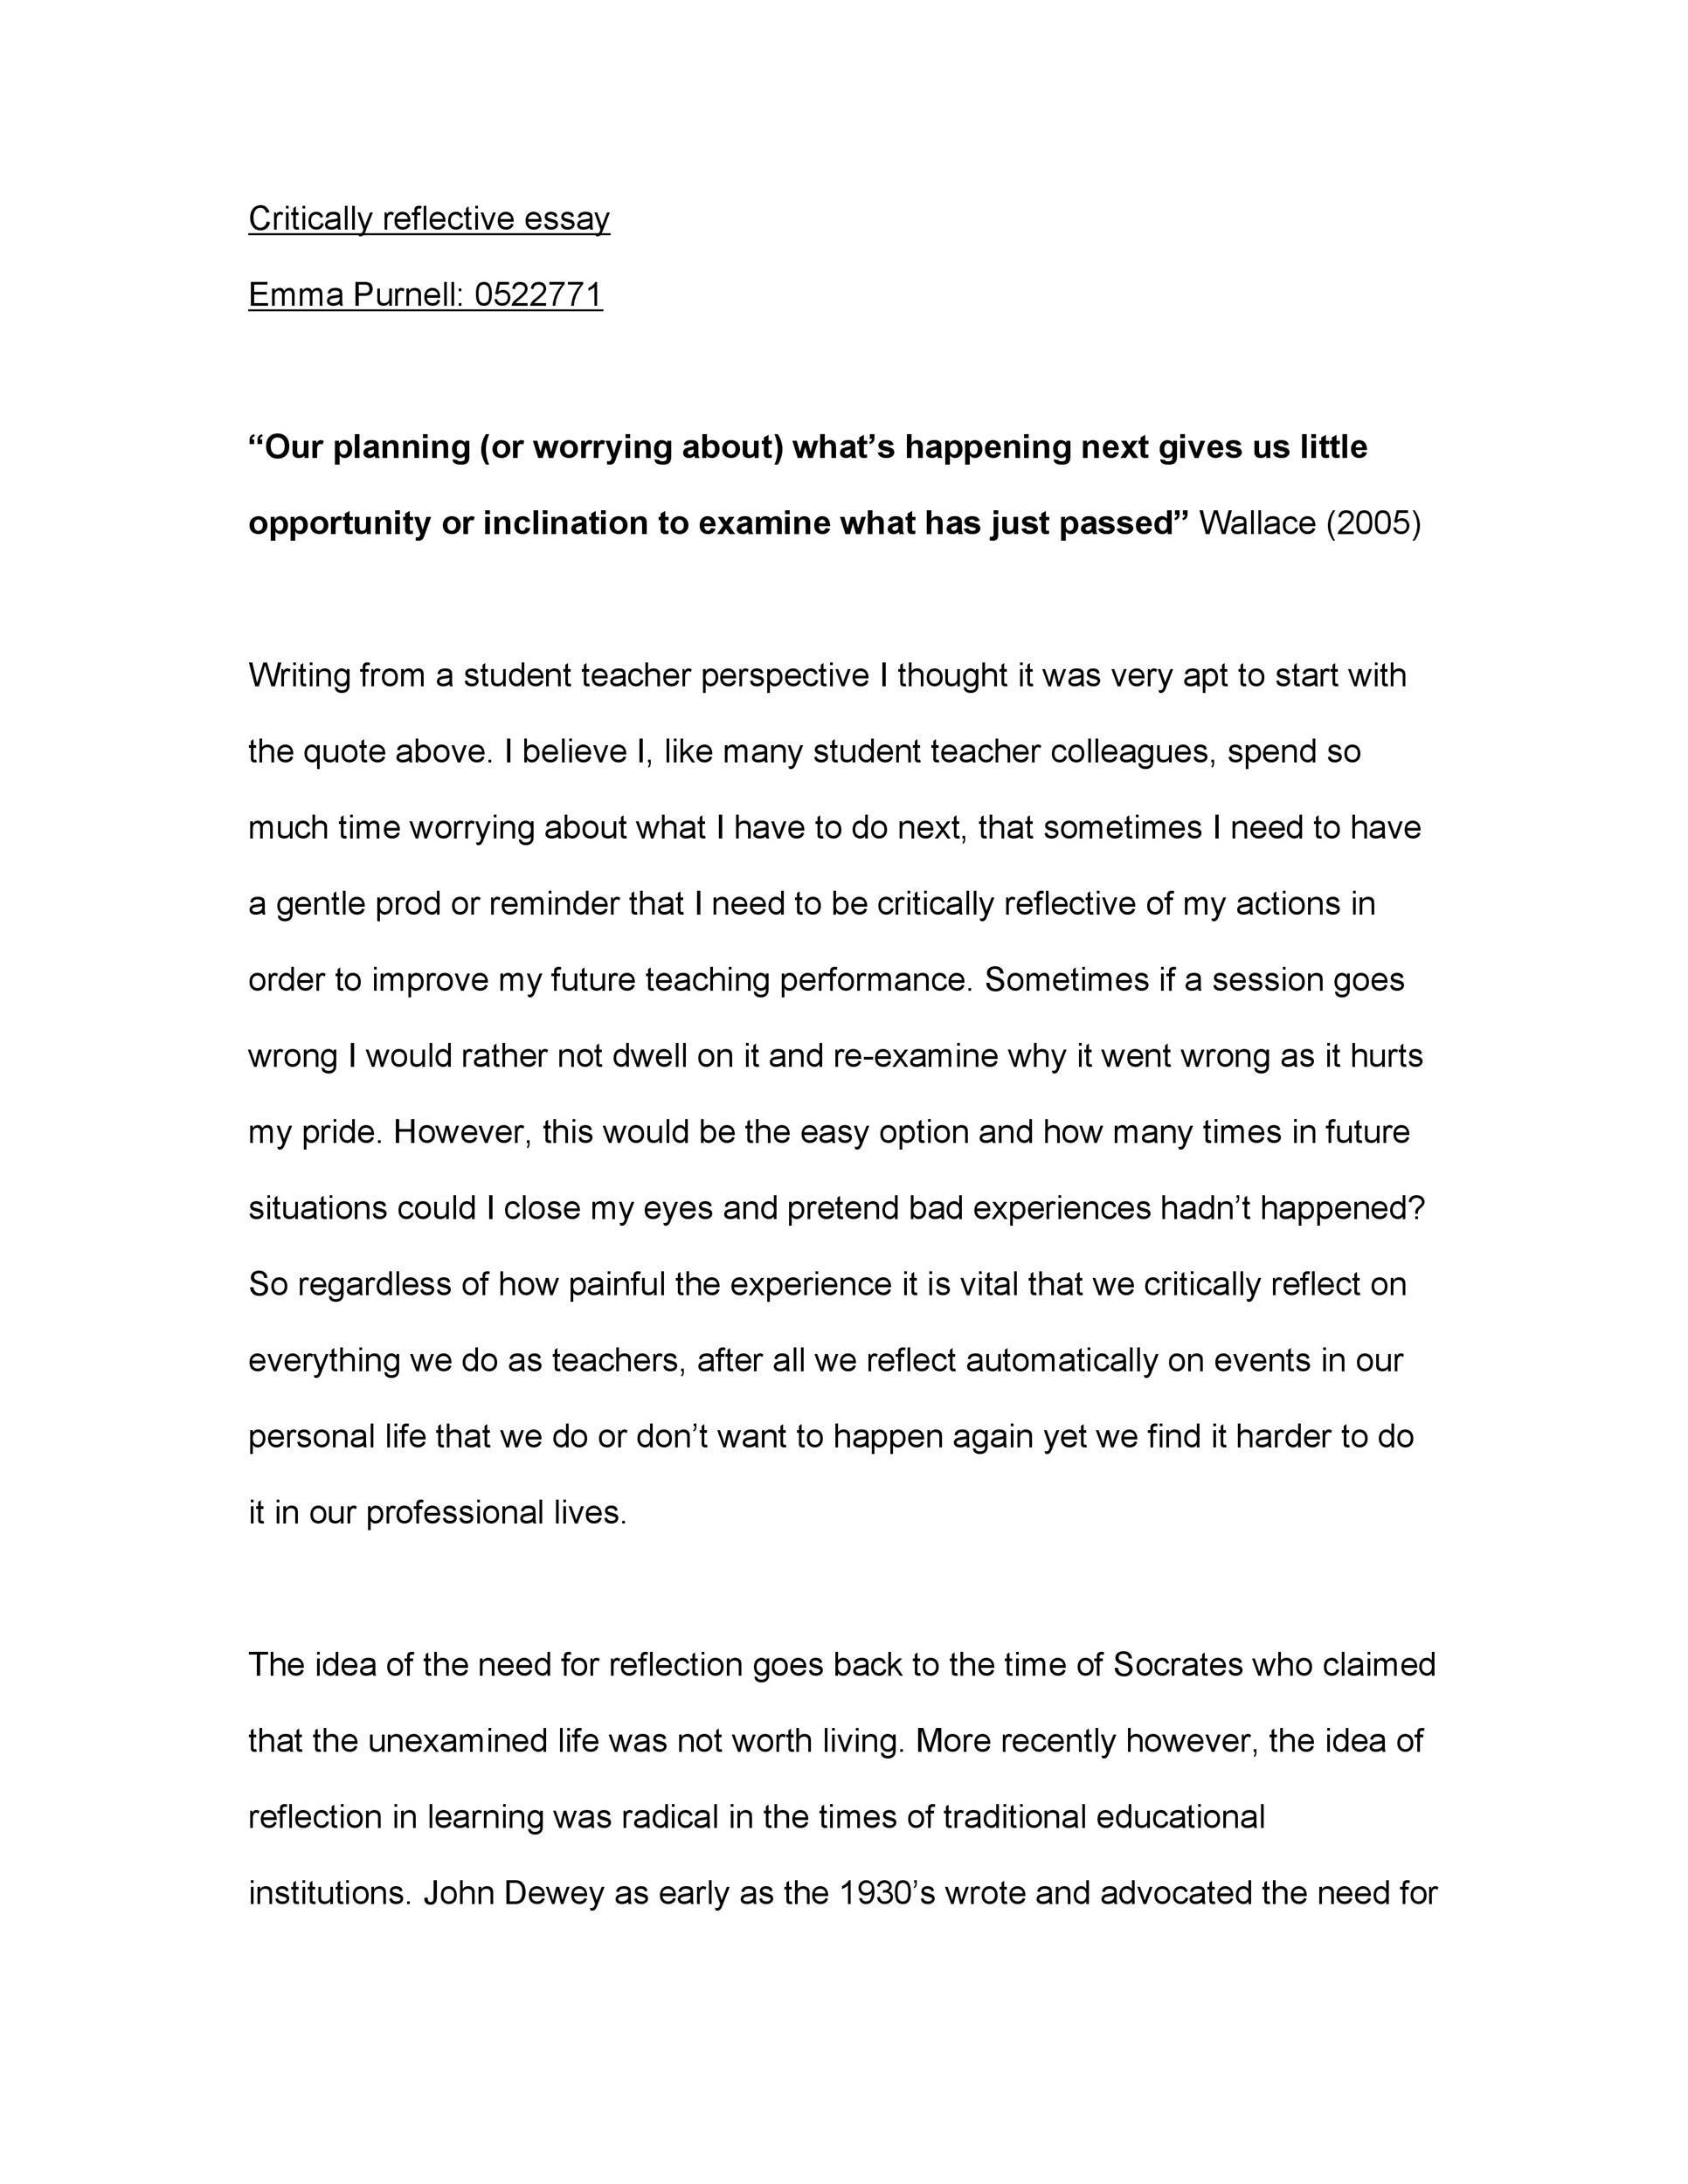 Free reflective essay example 29